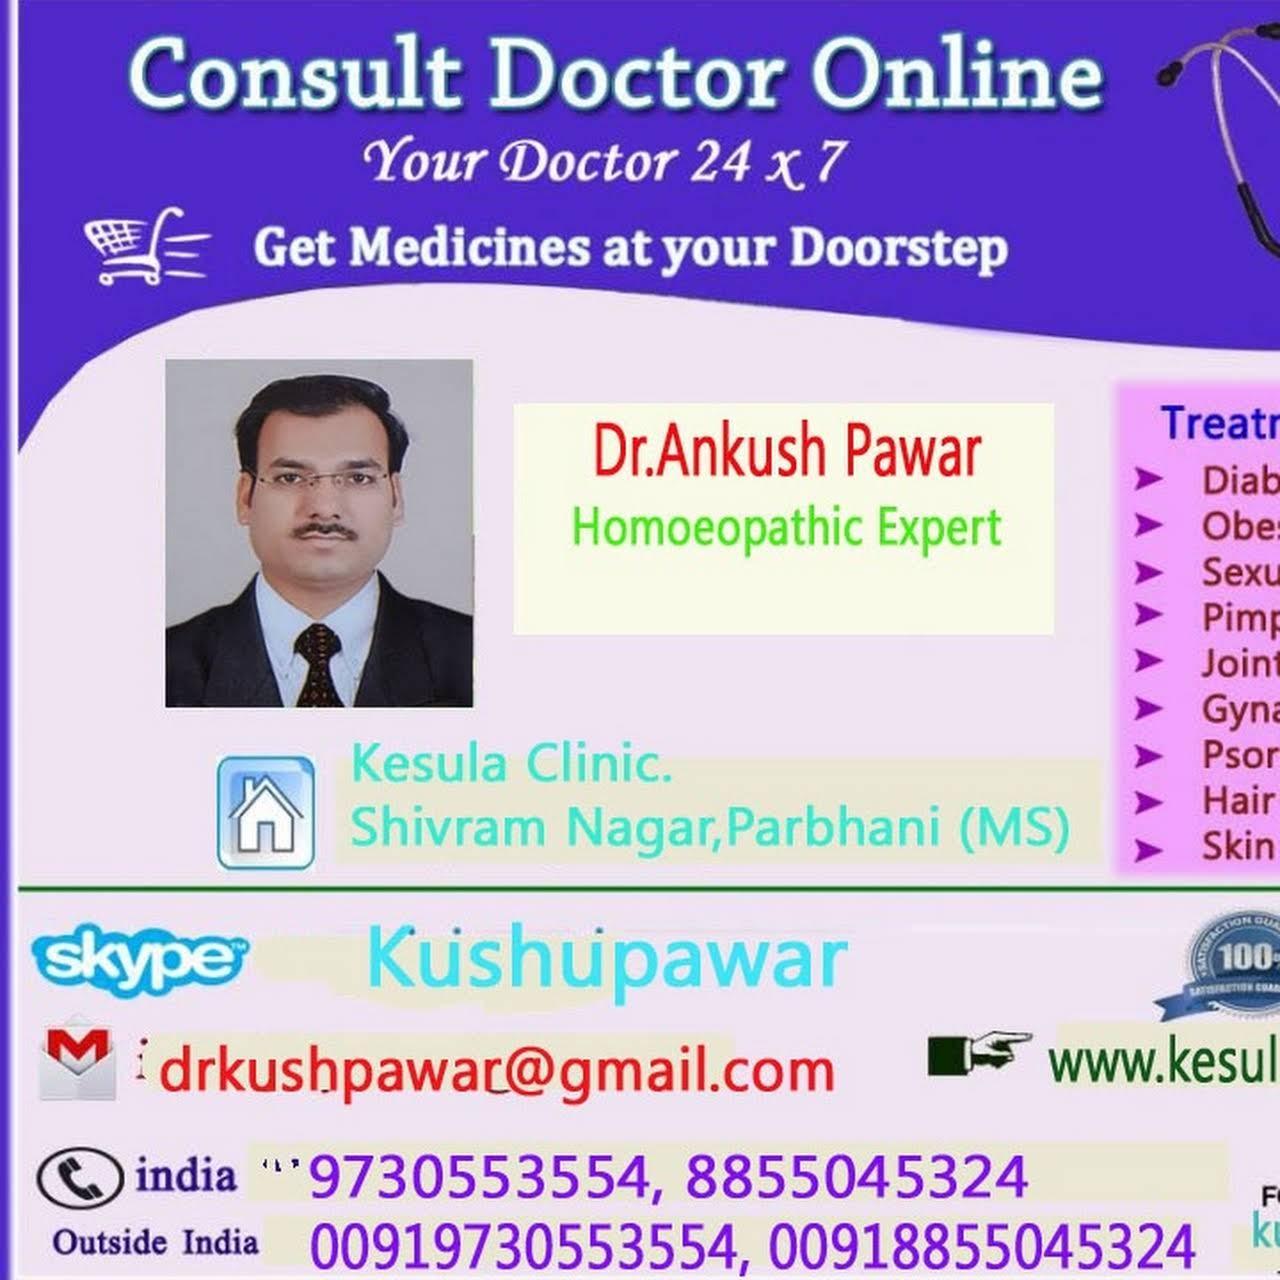 Dr. Ankush Pawar's Kesula Clinic